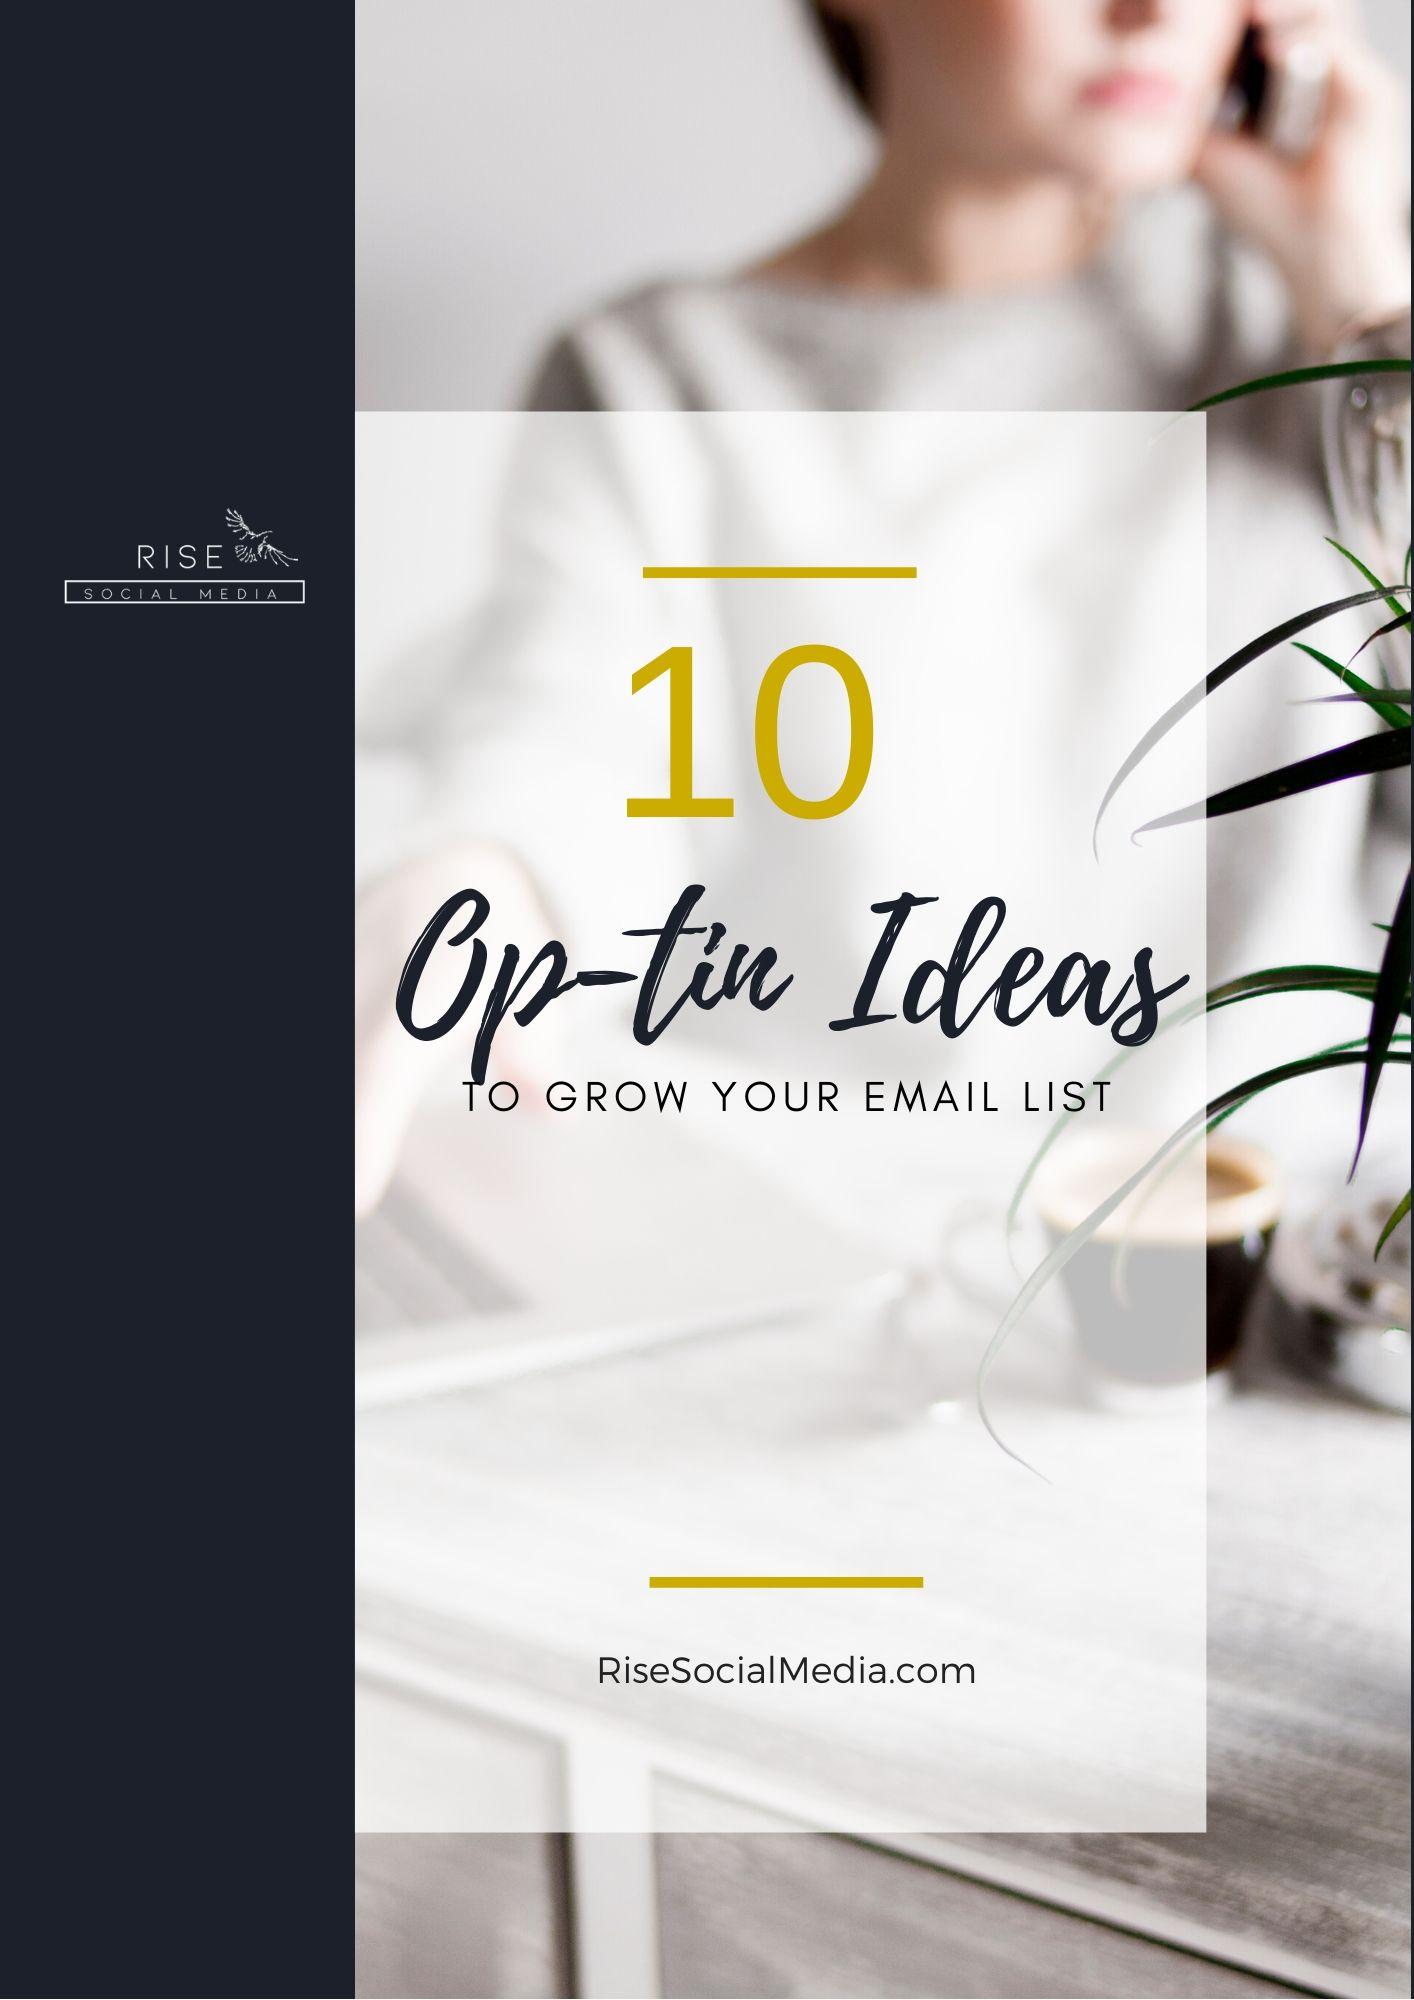 10 Optin Ideas To Build Your List 1